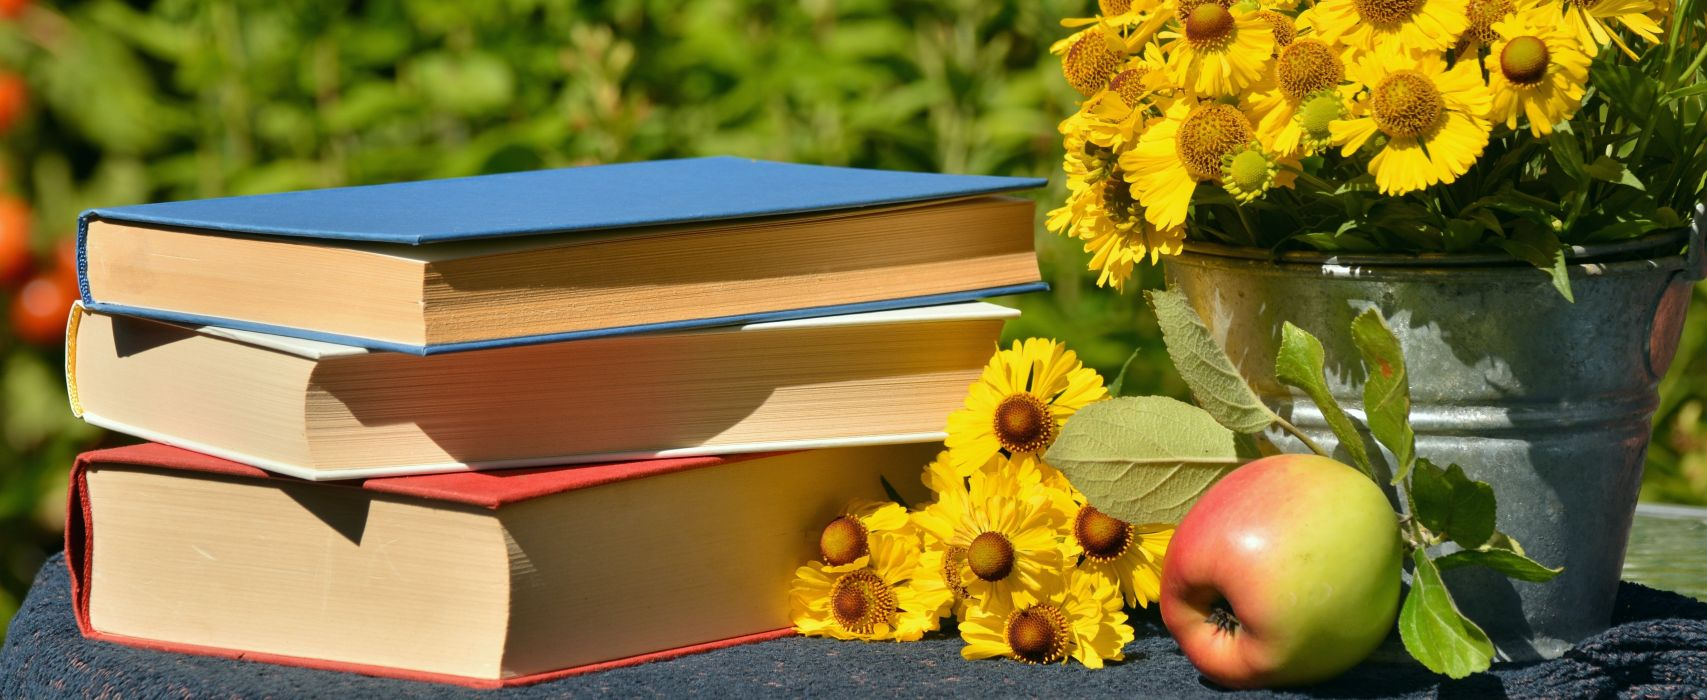 Books Read Garden Sun Brews Apple Literature wallpaper